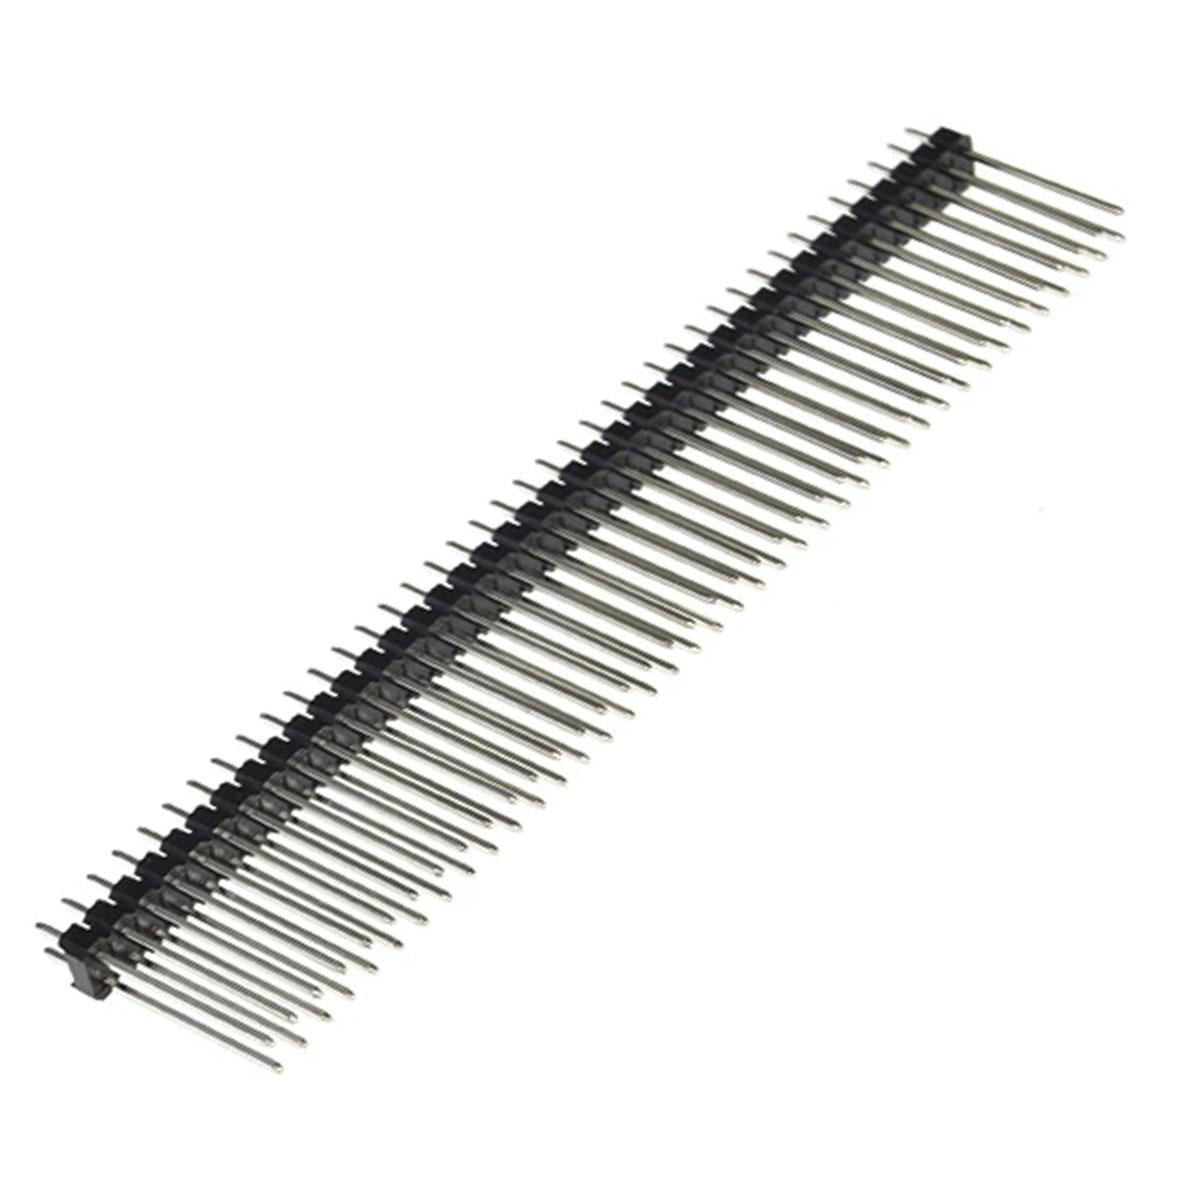 Barra de Pinos Macho Pin Header 2x40x20 - Passo 2,54mm 180º